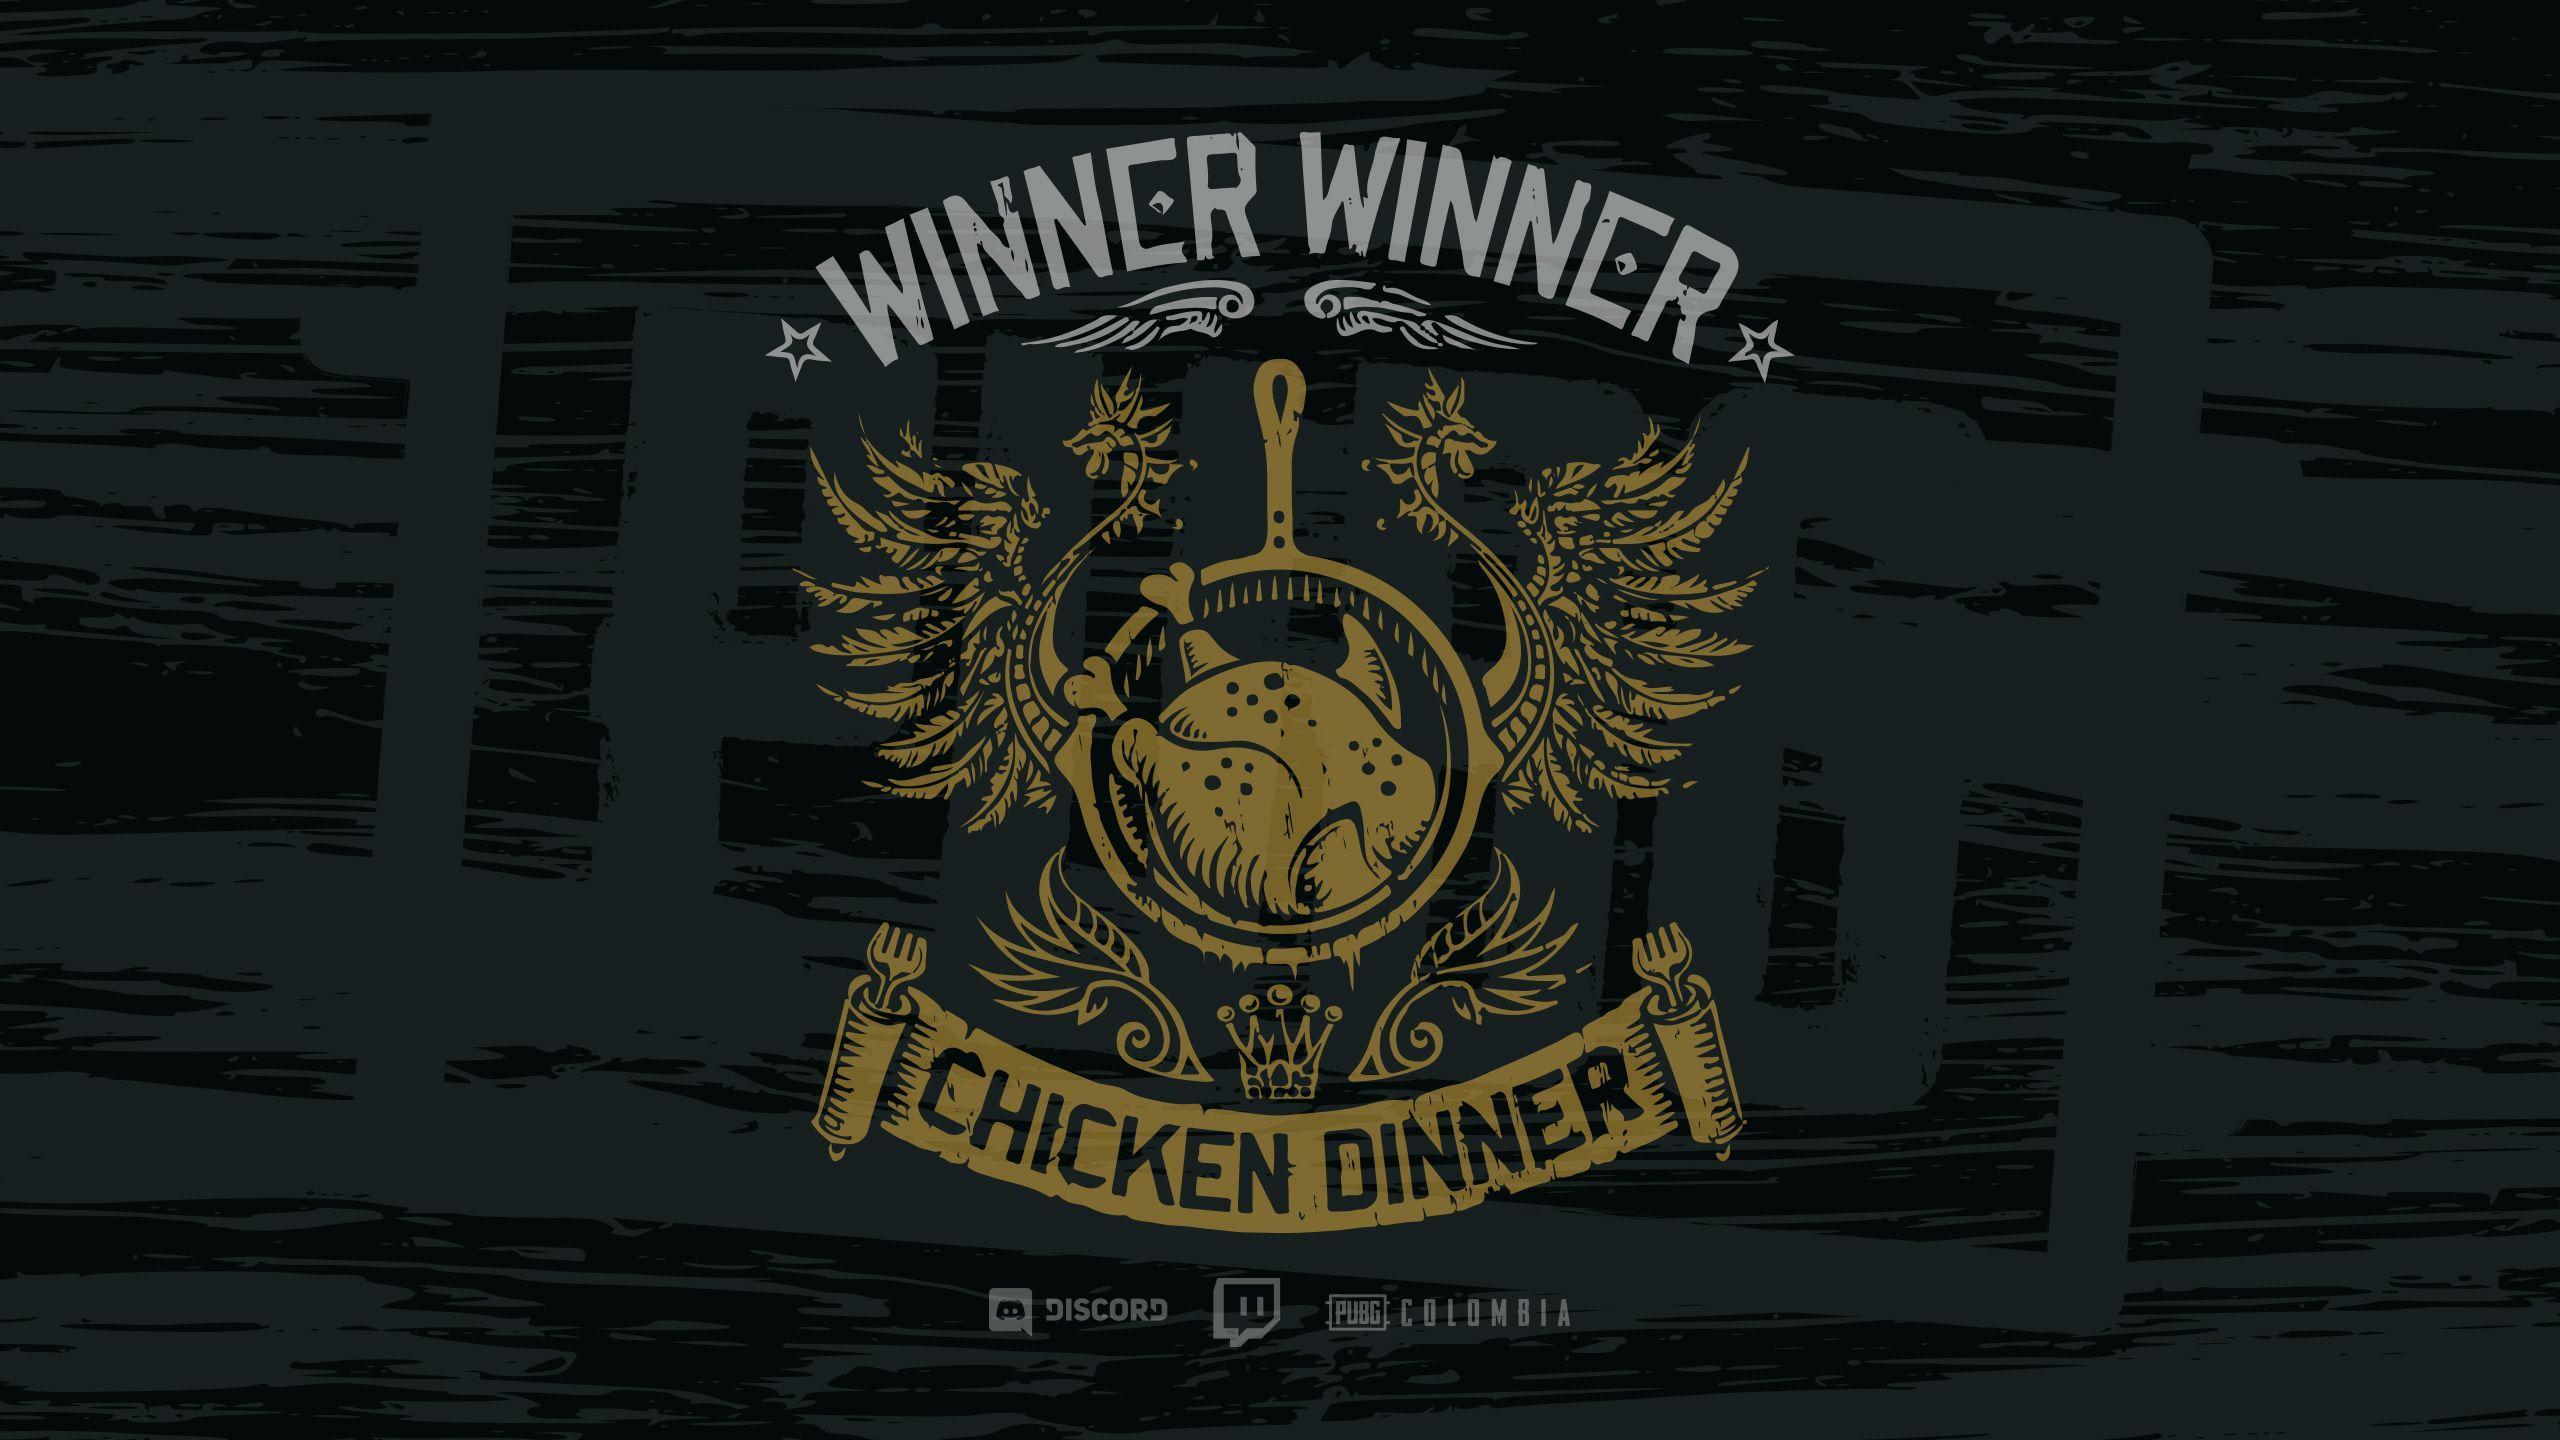 Chicken Dinner Pubg Wallpaper Winner Winner Chicken Dinner Wallpapers Wallpaper Cave